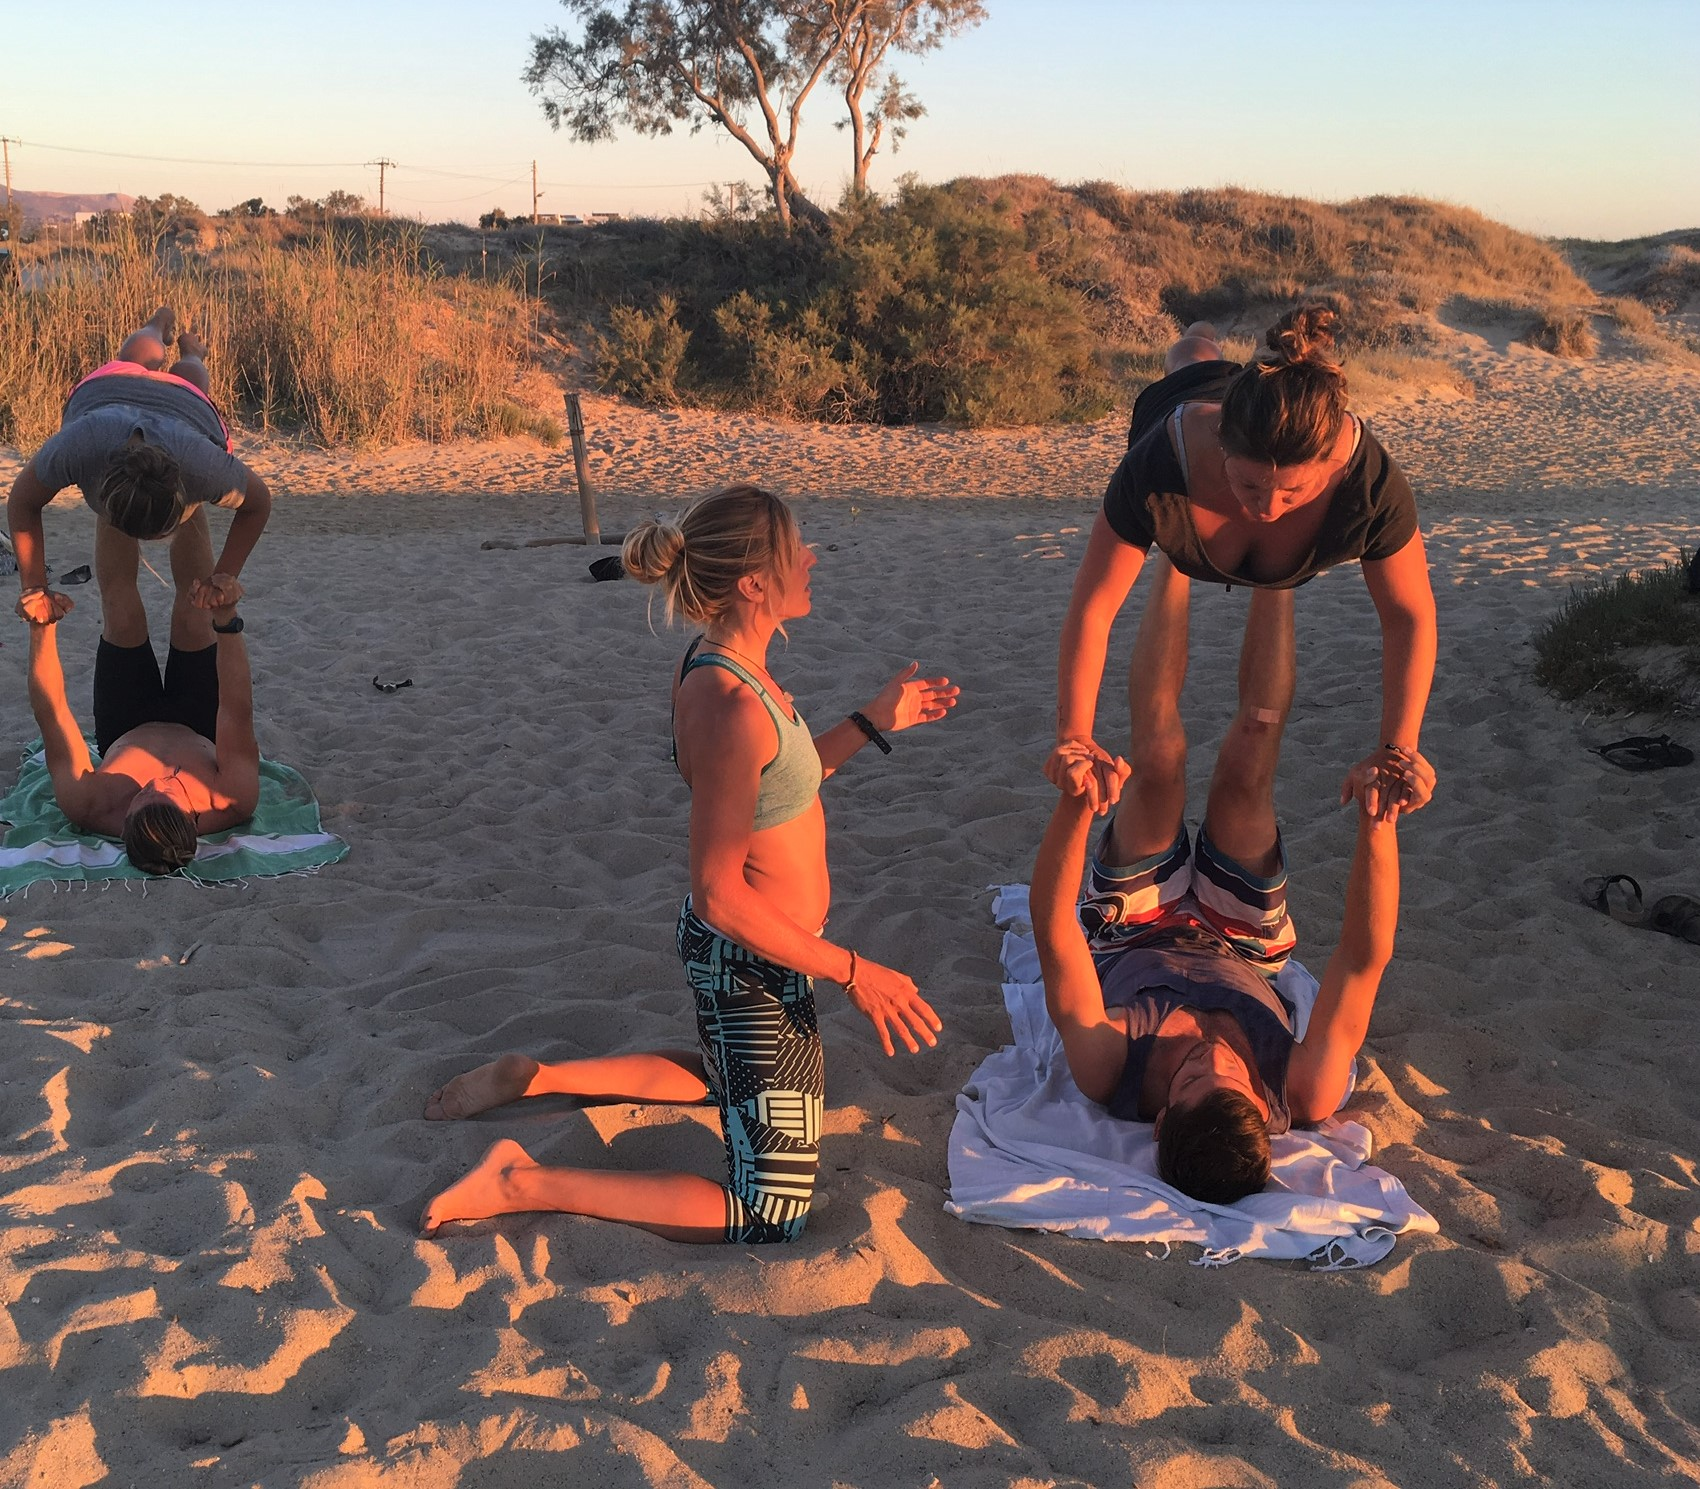 yoga balance camp flisvos sportclub naxos greece summer 2021 sommer event urlaub yoga ferien reisen